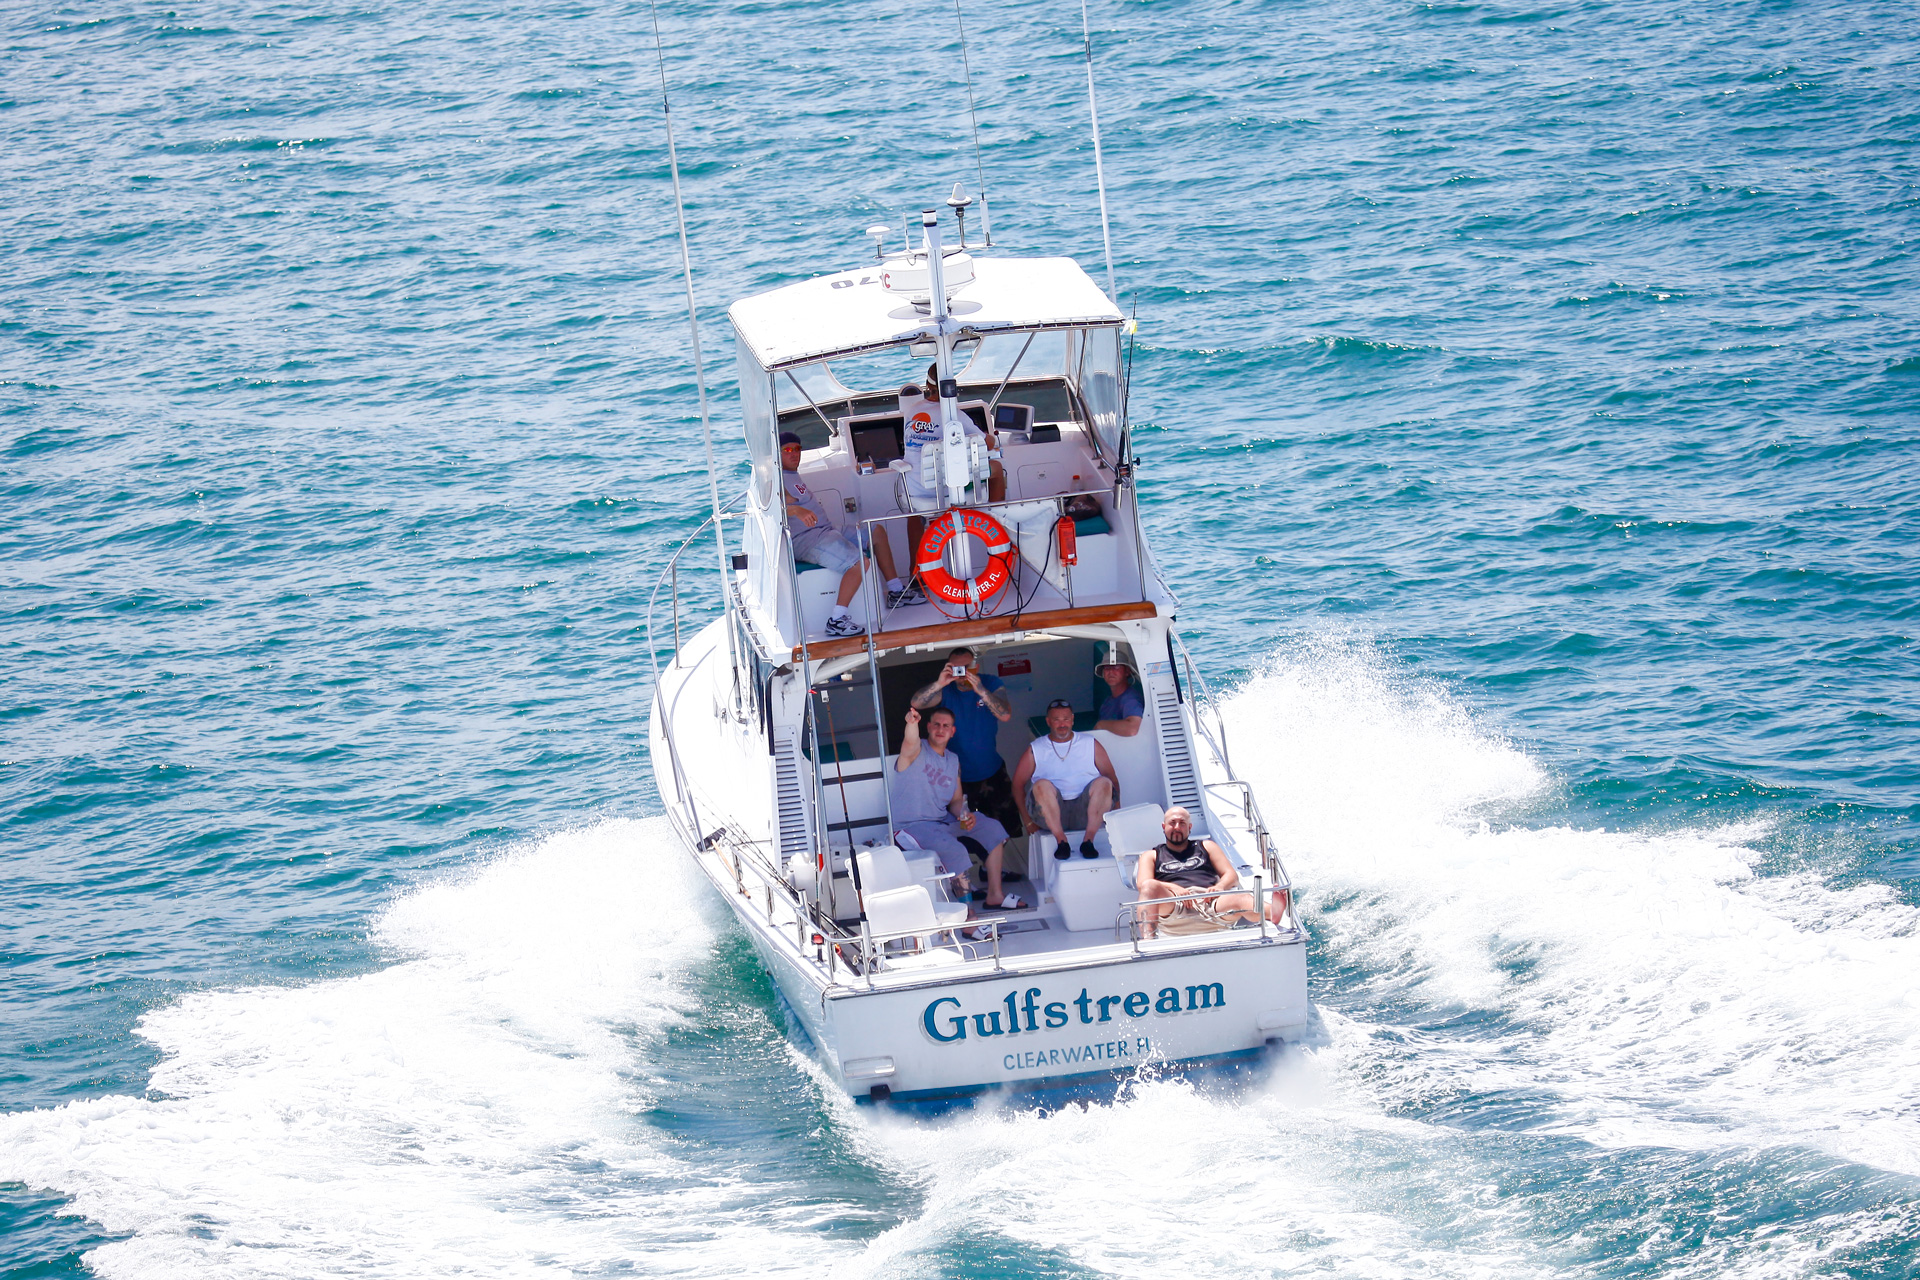 Aerielof Gulfstream